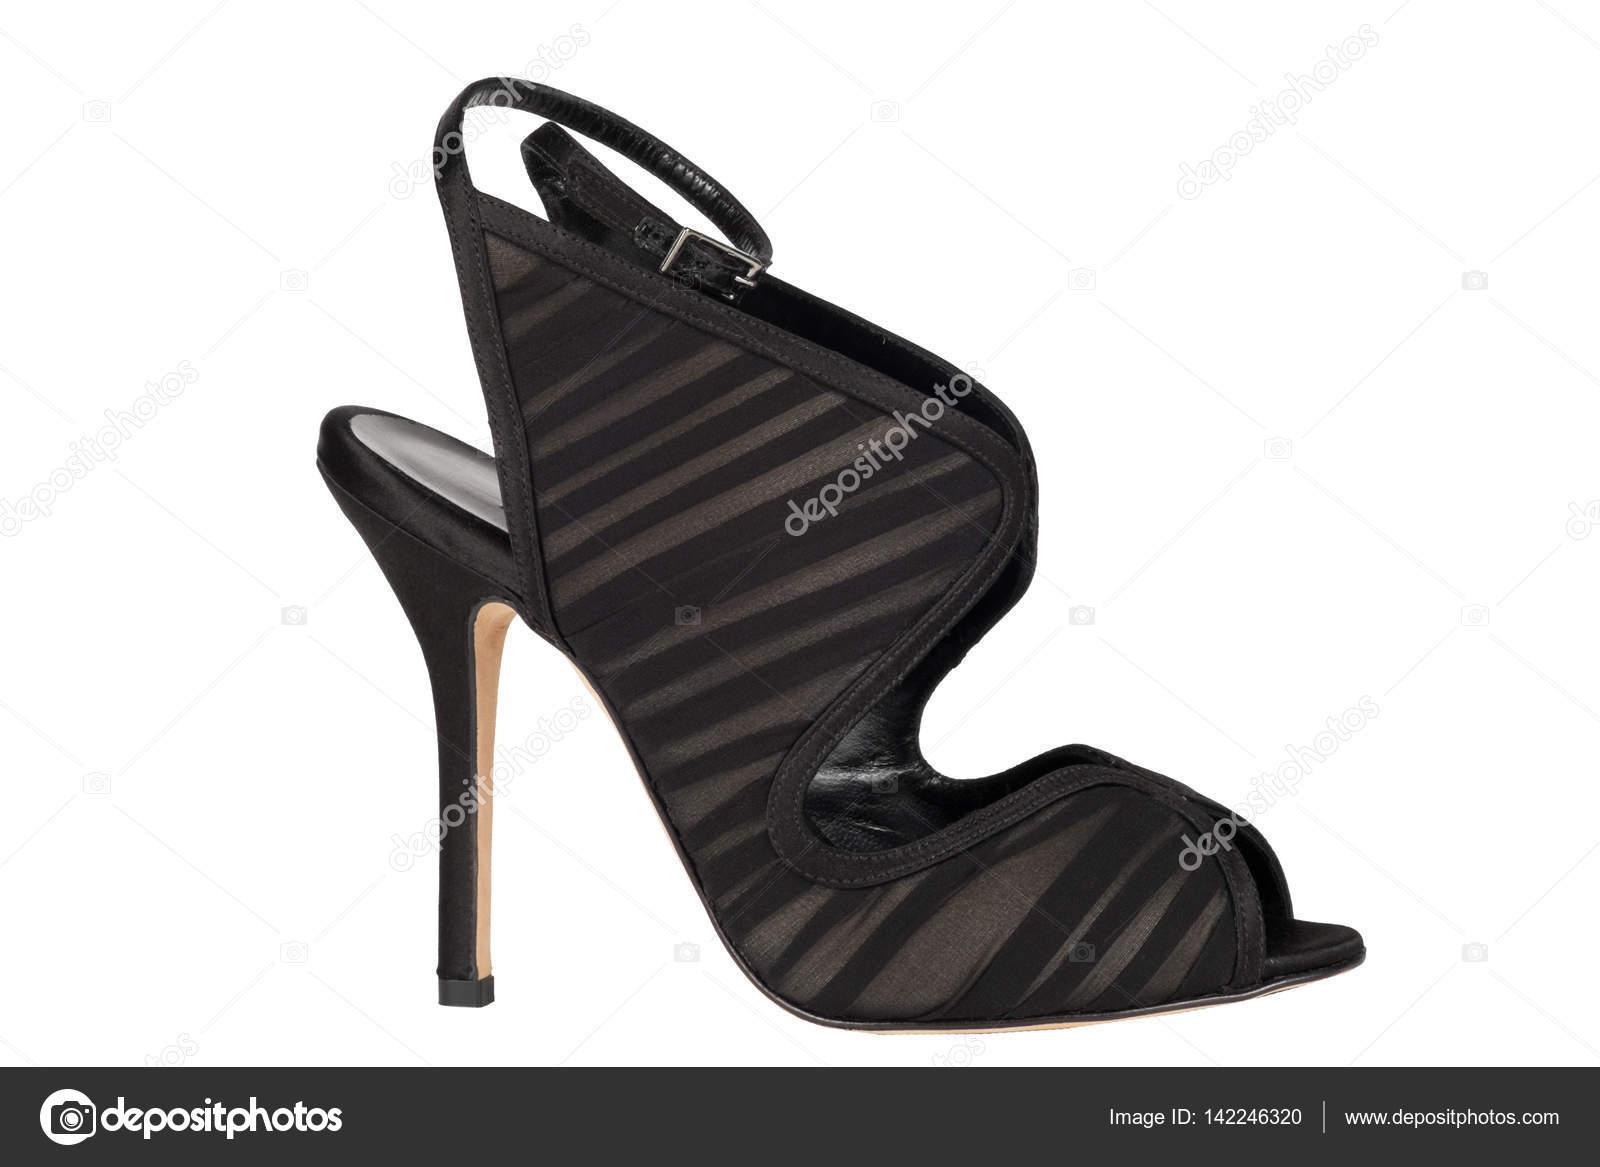 d103baabe8ce2 Zapatos. Zapatos de mujer sobre un fondo blanco. calzado Premium. Zapatos  italianos marca